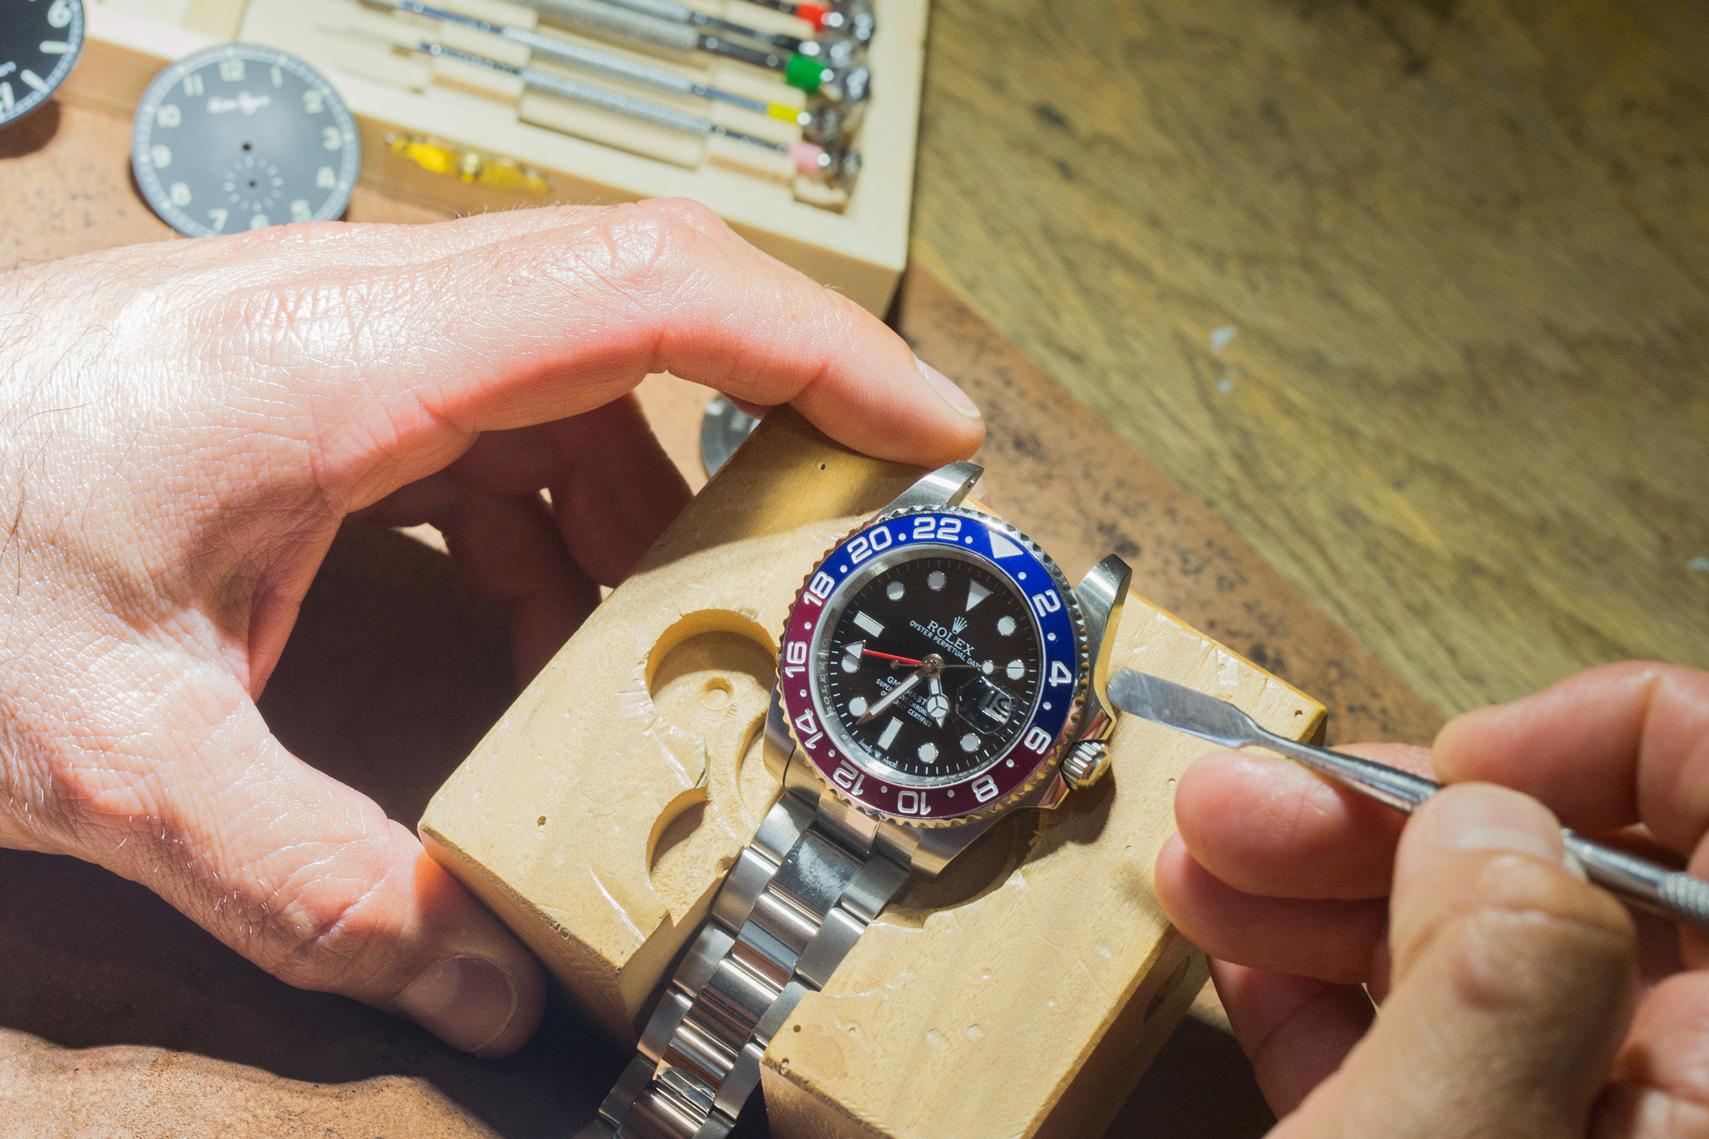 Market Street Diamonds Watch Services